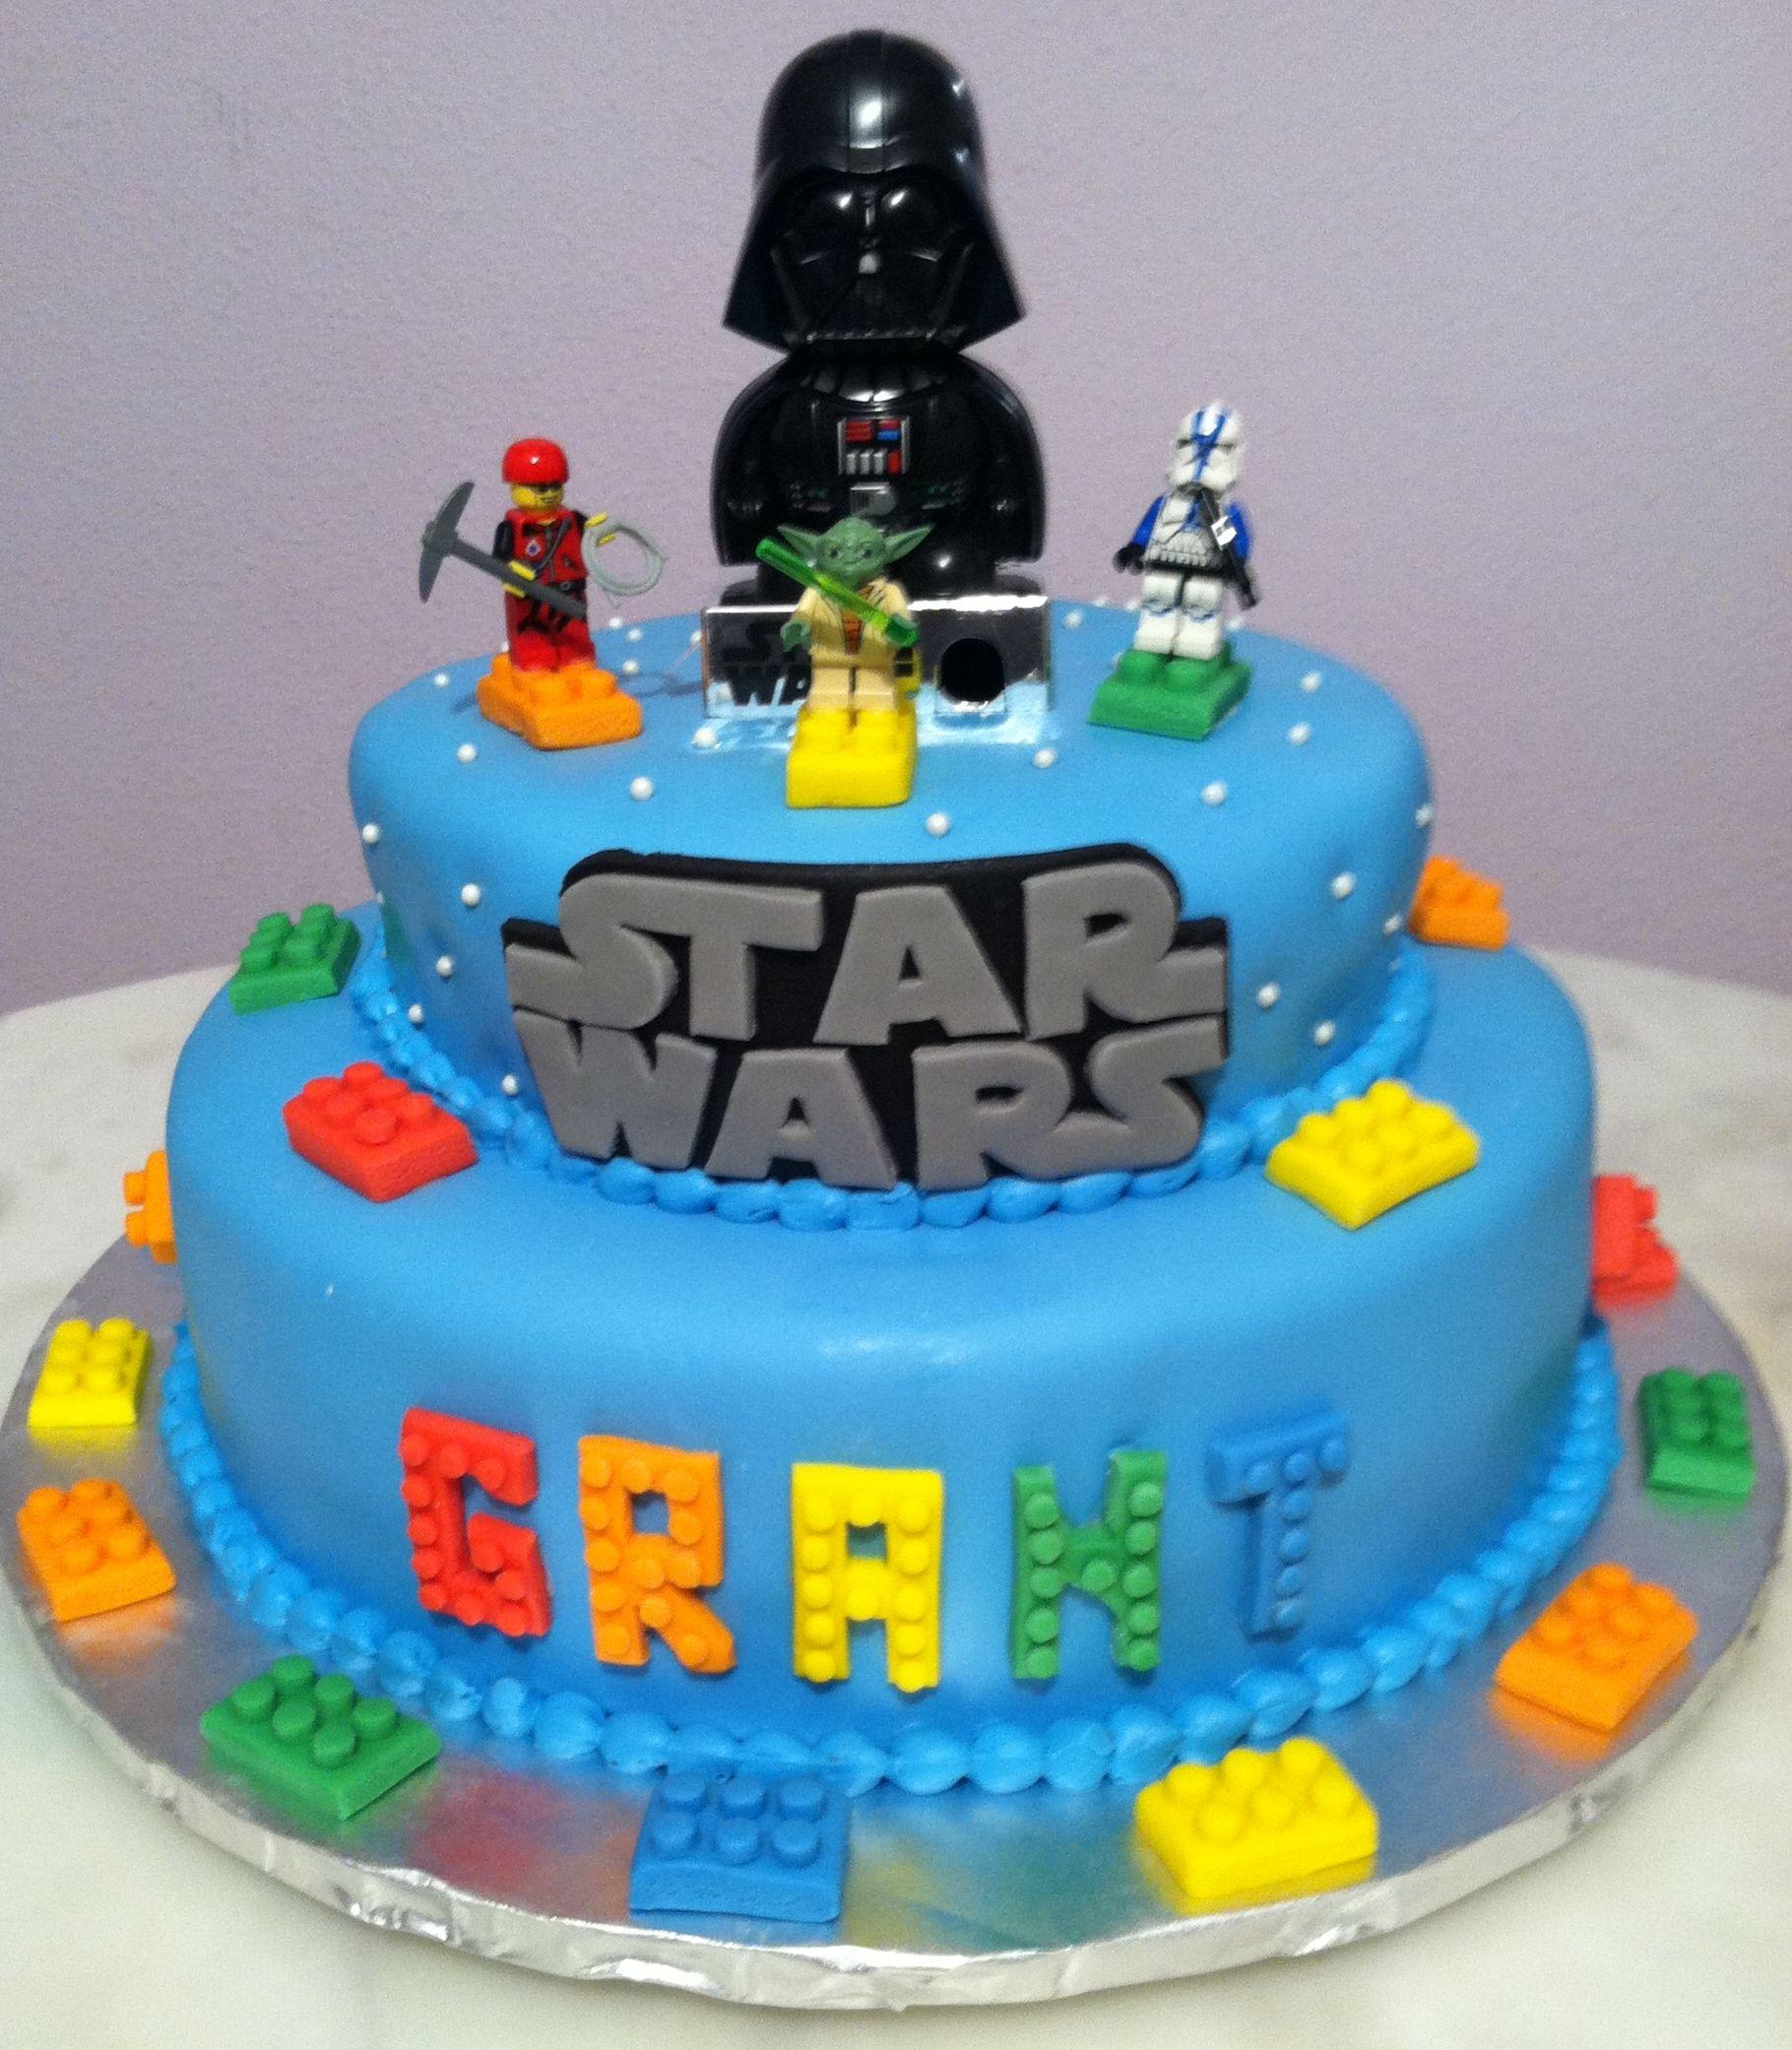 Birthday Cake Lego Number Google Search Birthday Treat Ideas - Lego birthday cake decorations